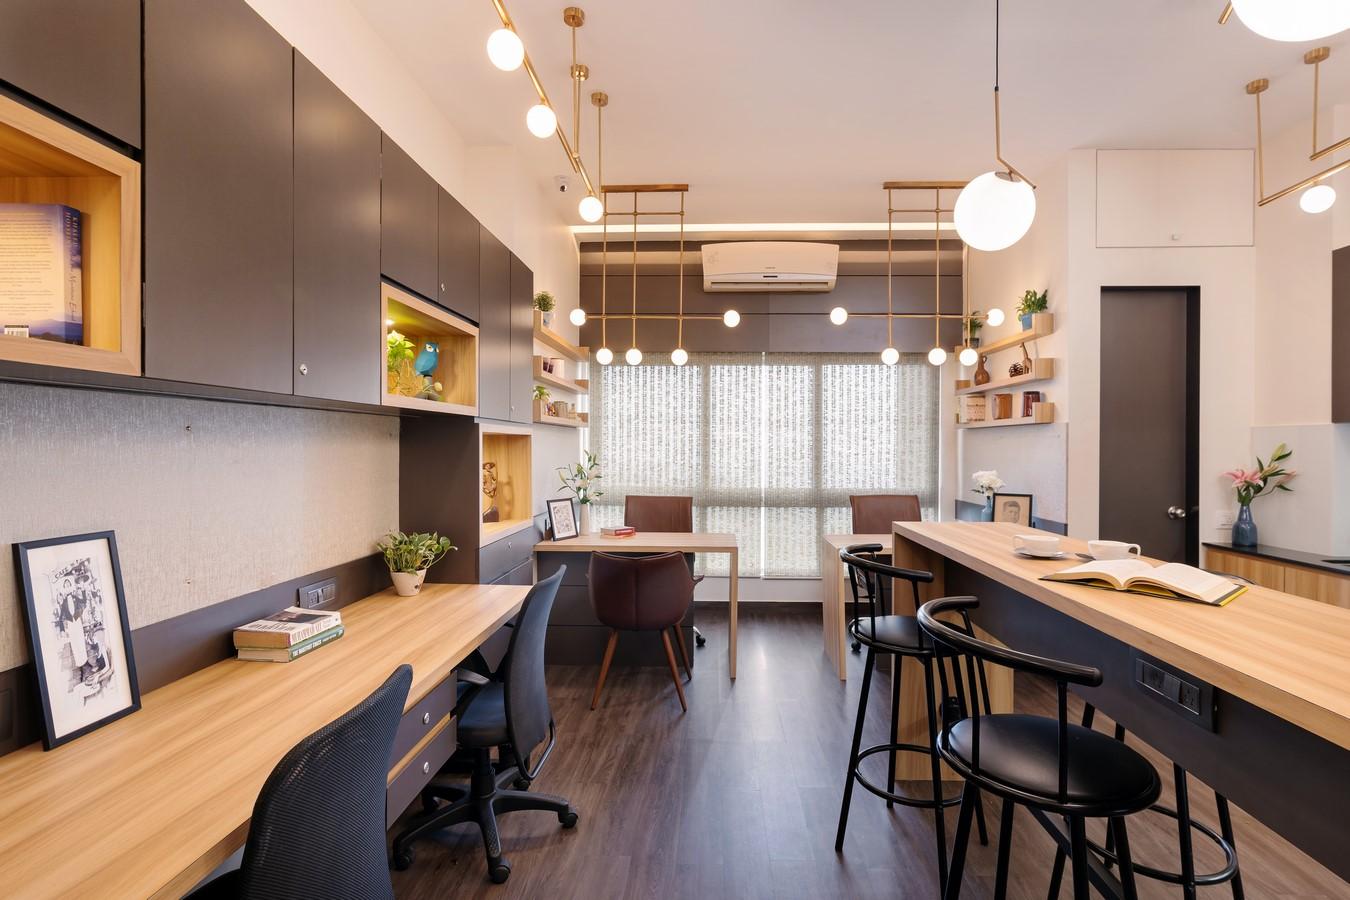 5147 Shibui Office byThe Design Chapel: Sheet 1